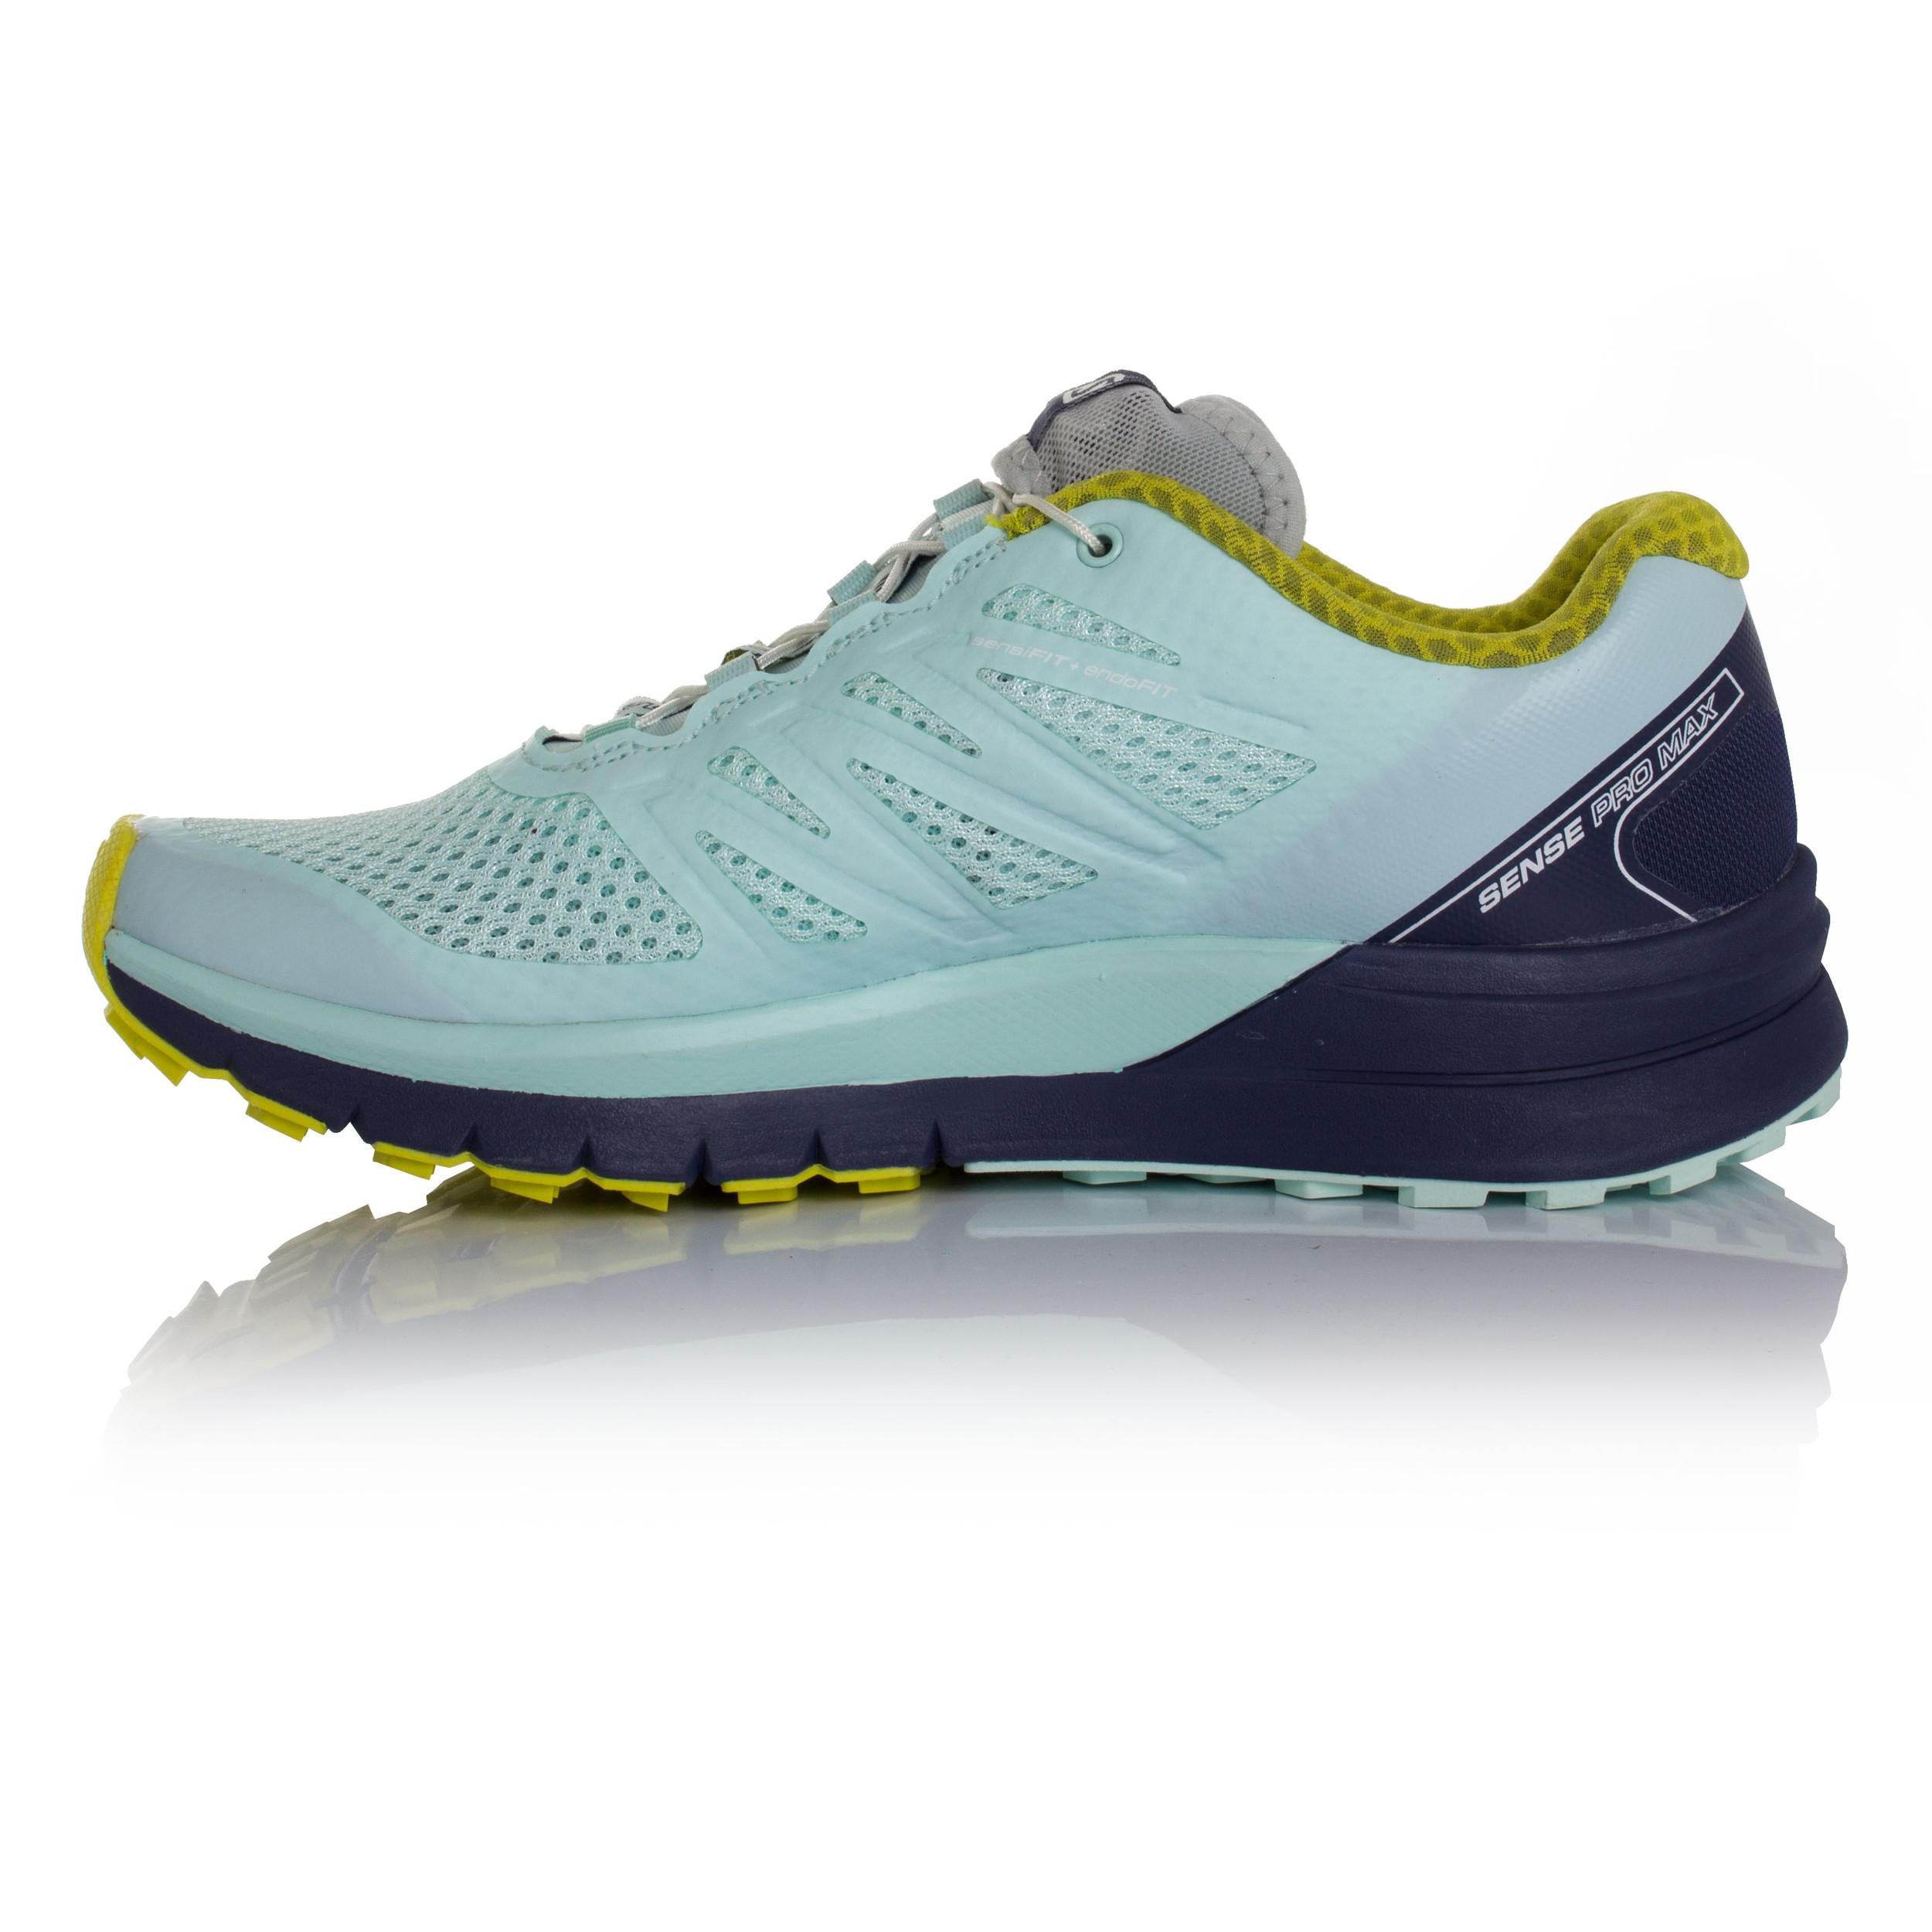 Salomon-Sense-Pro-Max-Mujer-Azul-Sendero-Running-Zapatos-Zapatillas-Correr